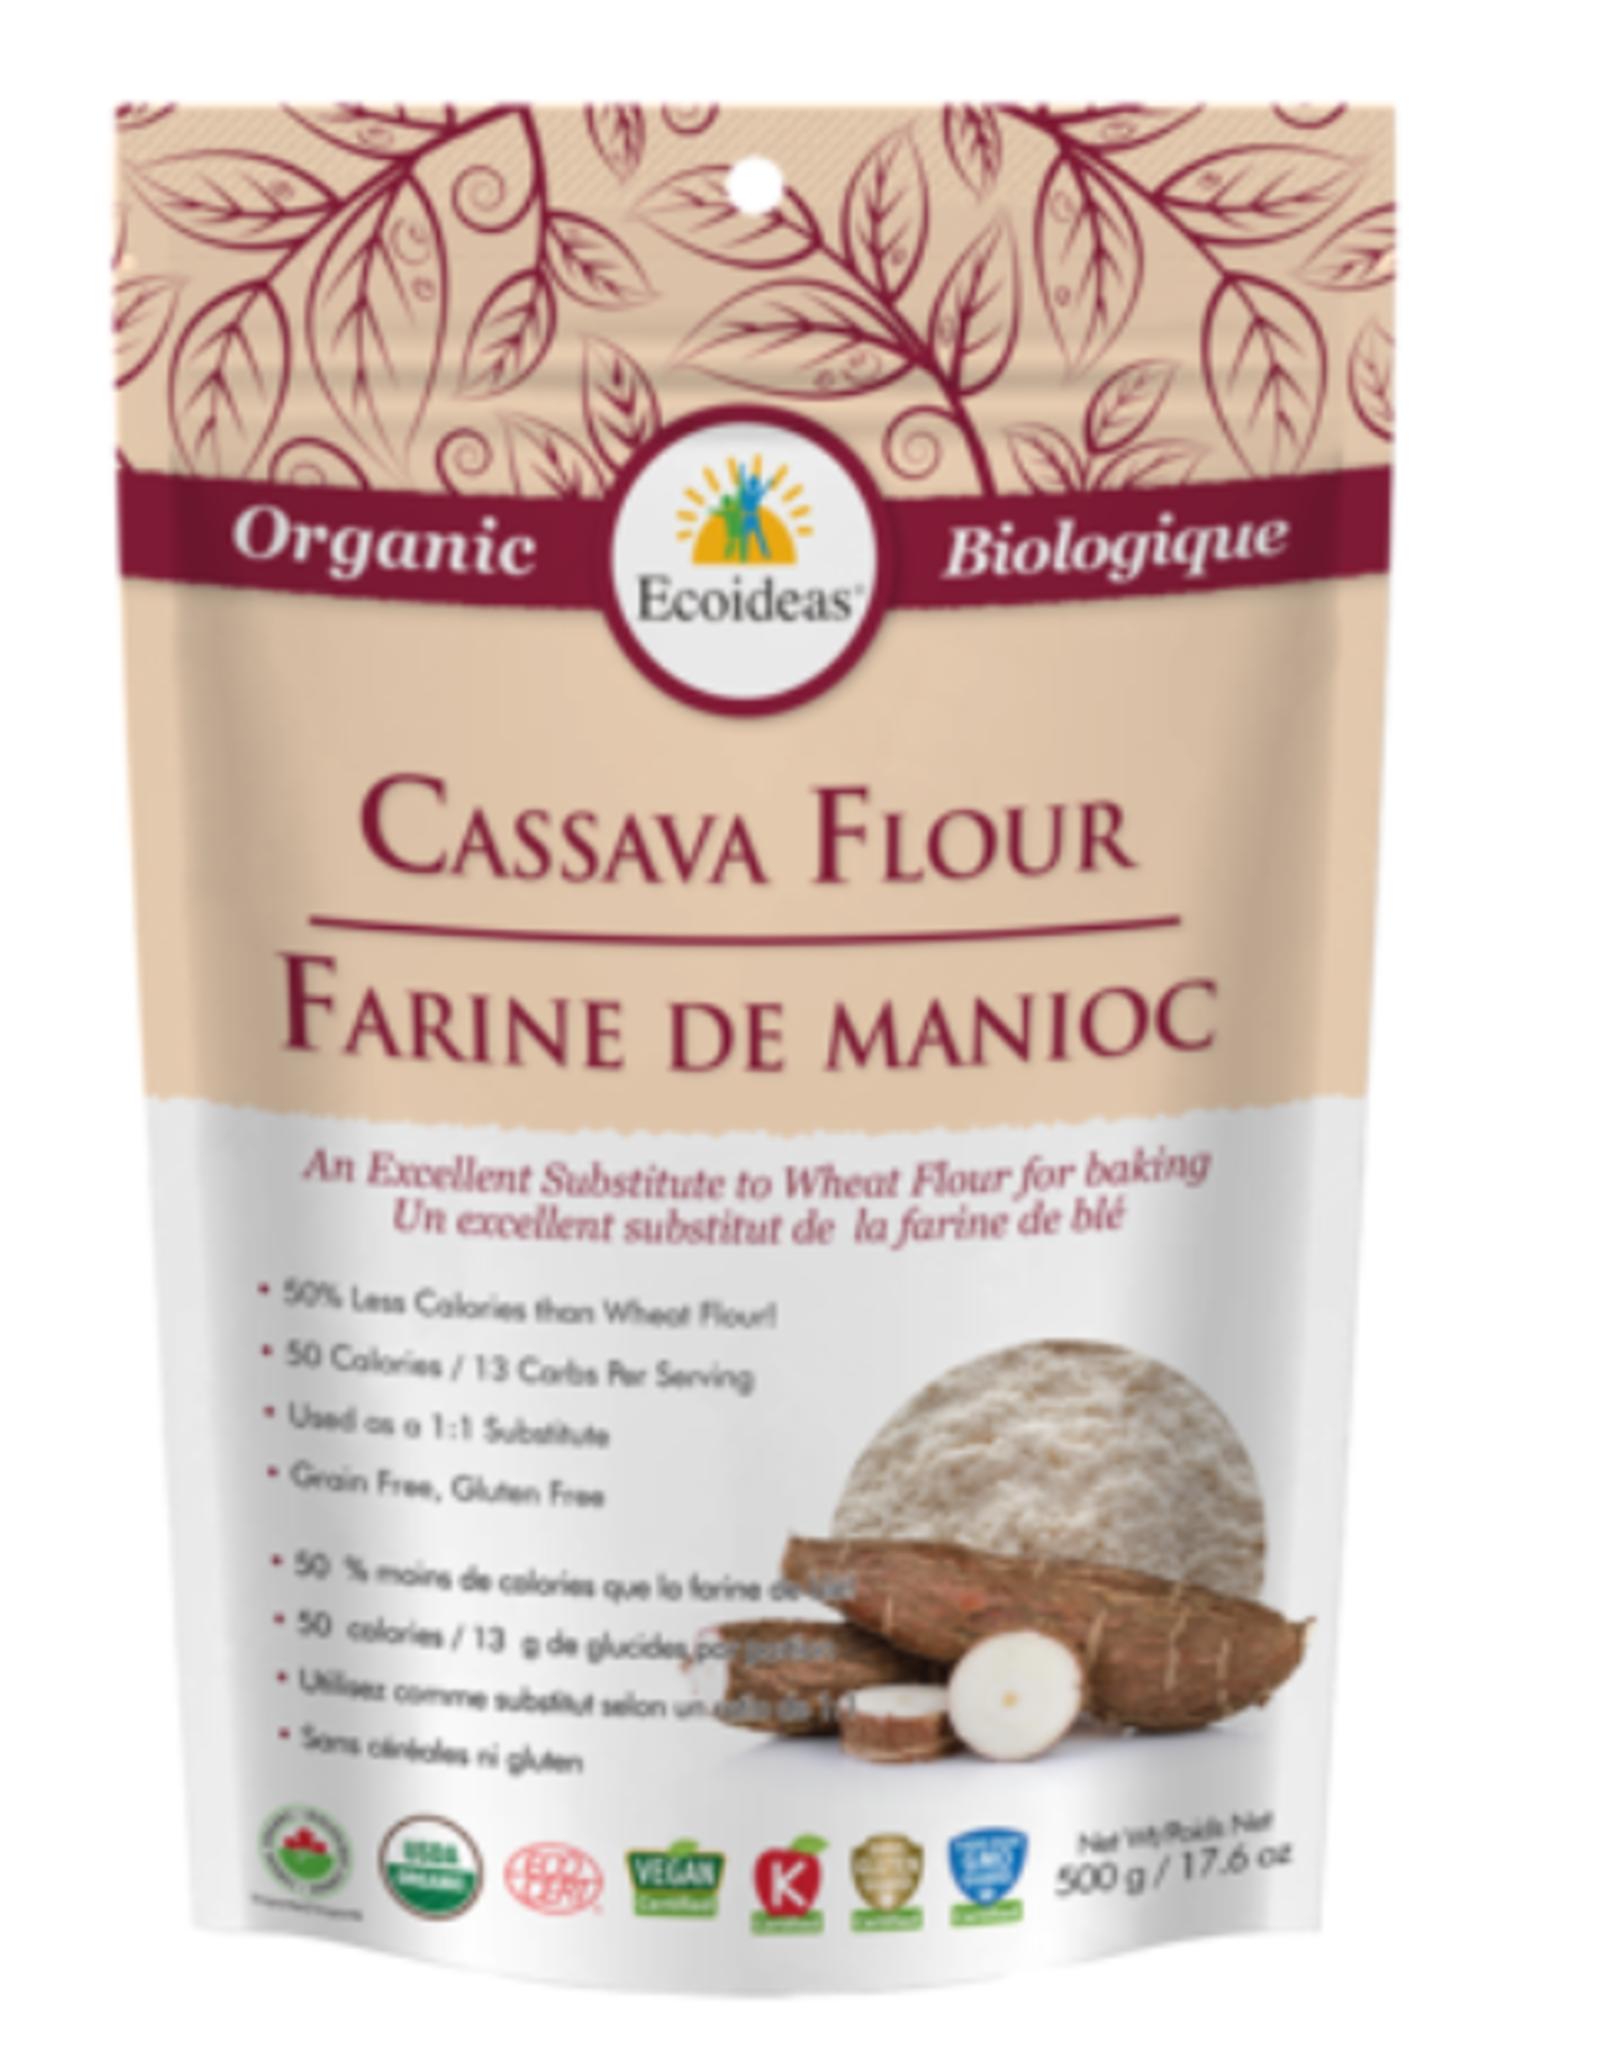 Ecoideas - Organic Cassava Flour (500g)